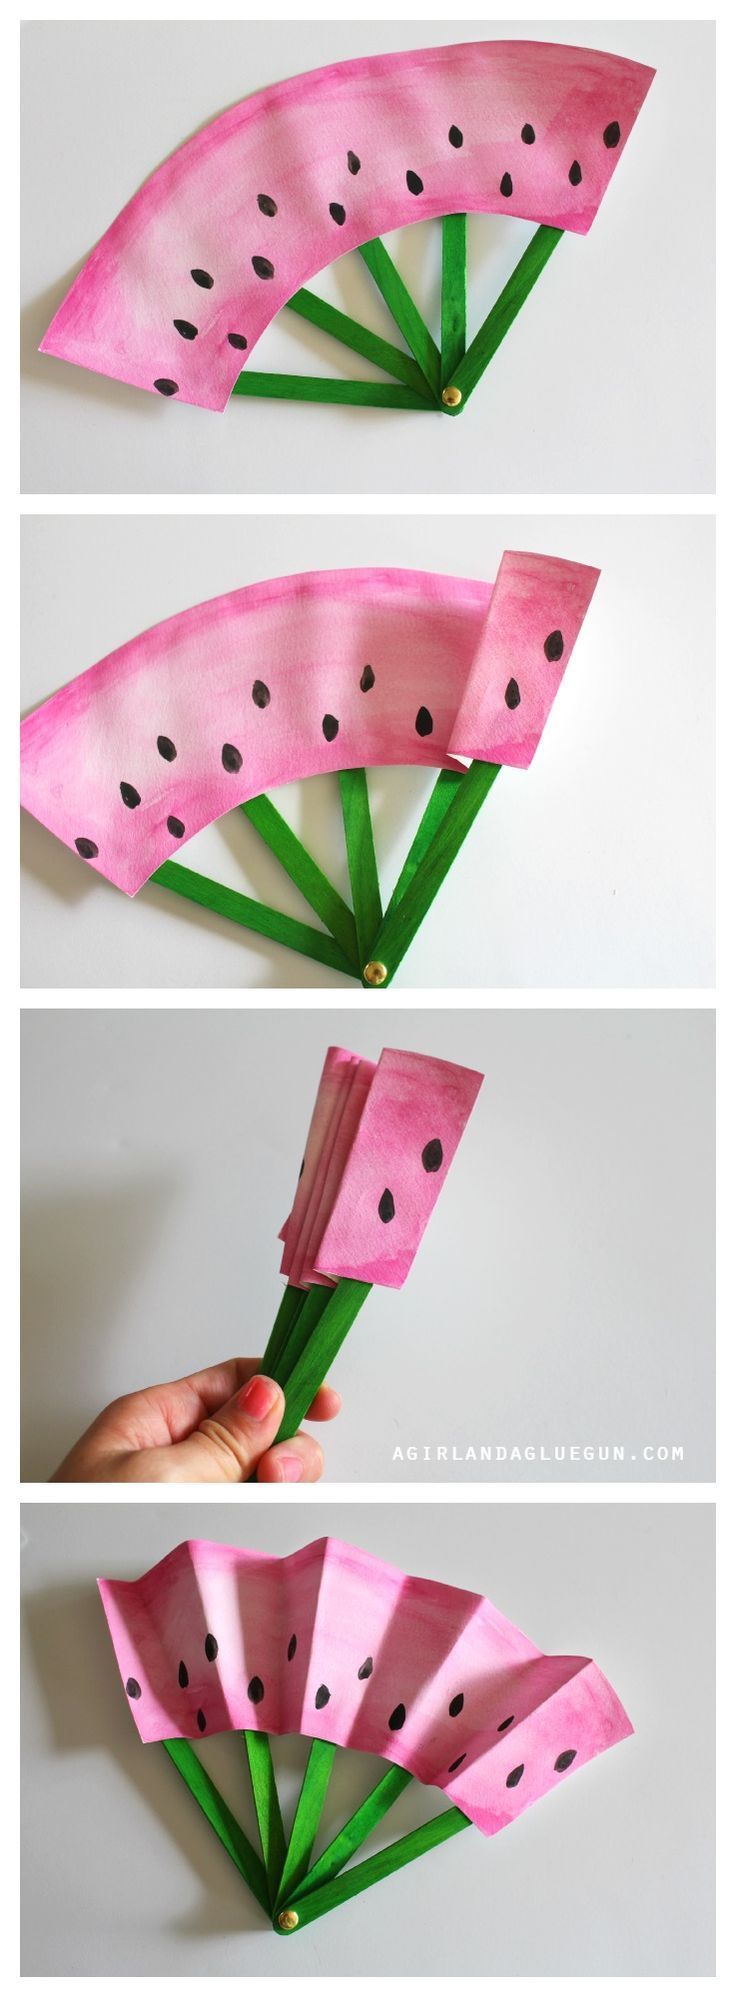 DIY Fruit Fans: Kids Craft   The Idea Room